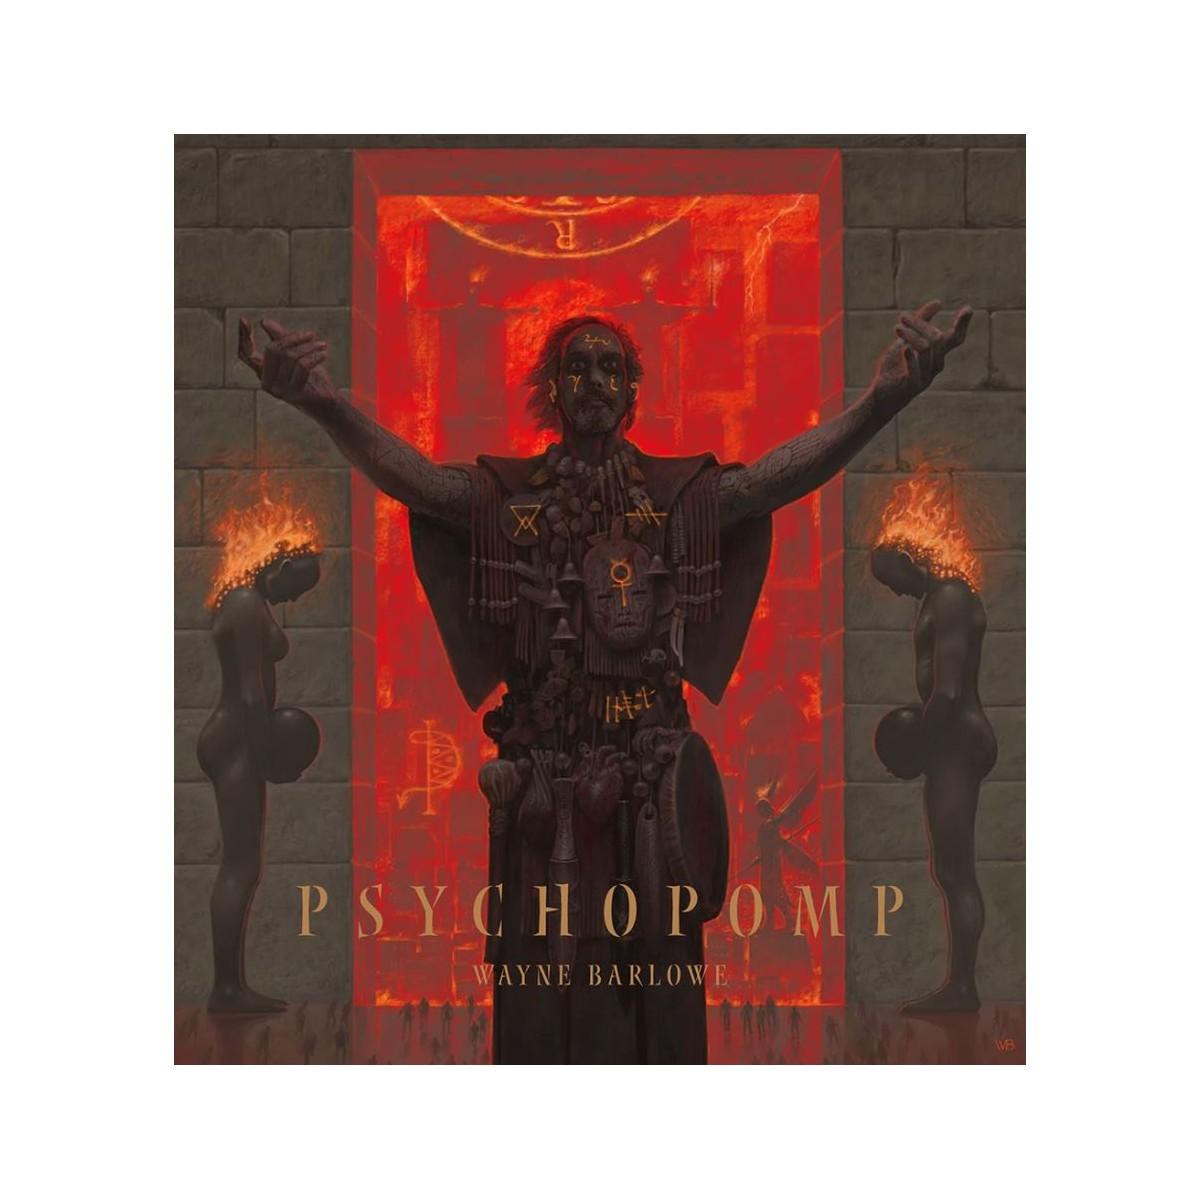 Wayne Barlowe - Psychopomp (Preorder)